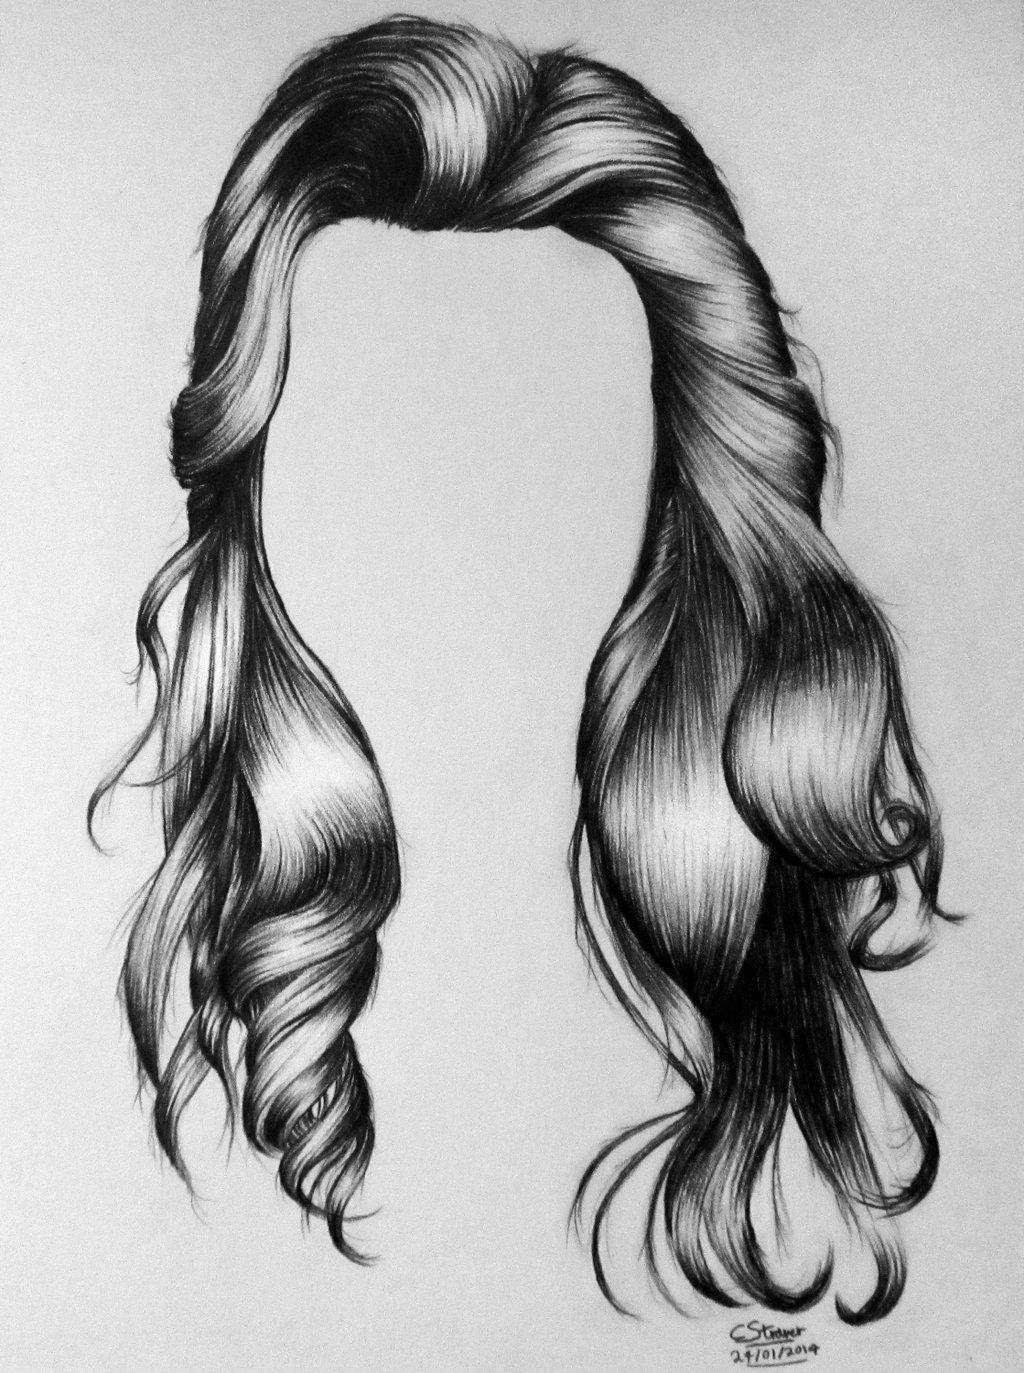 Drawn pen hair Hacerle peinado tu Hair tu